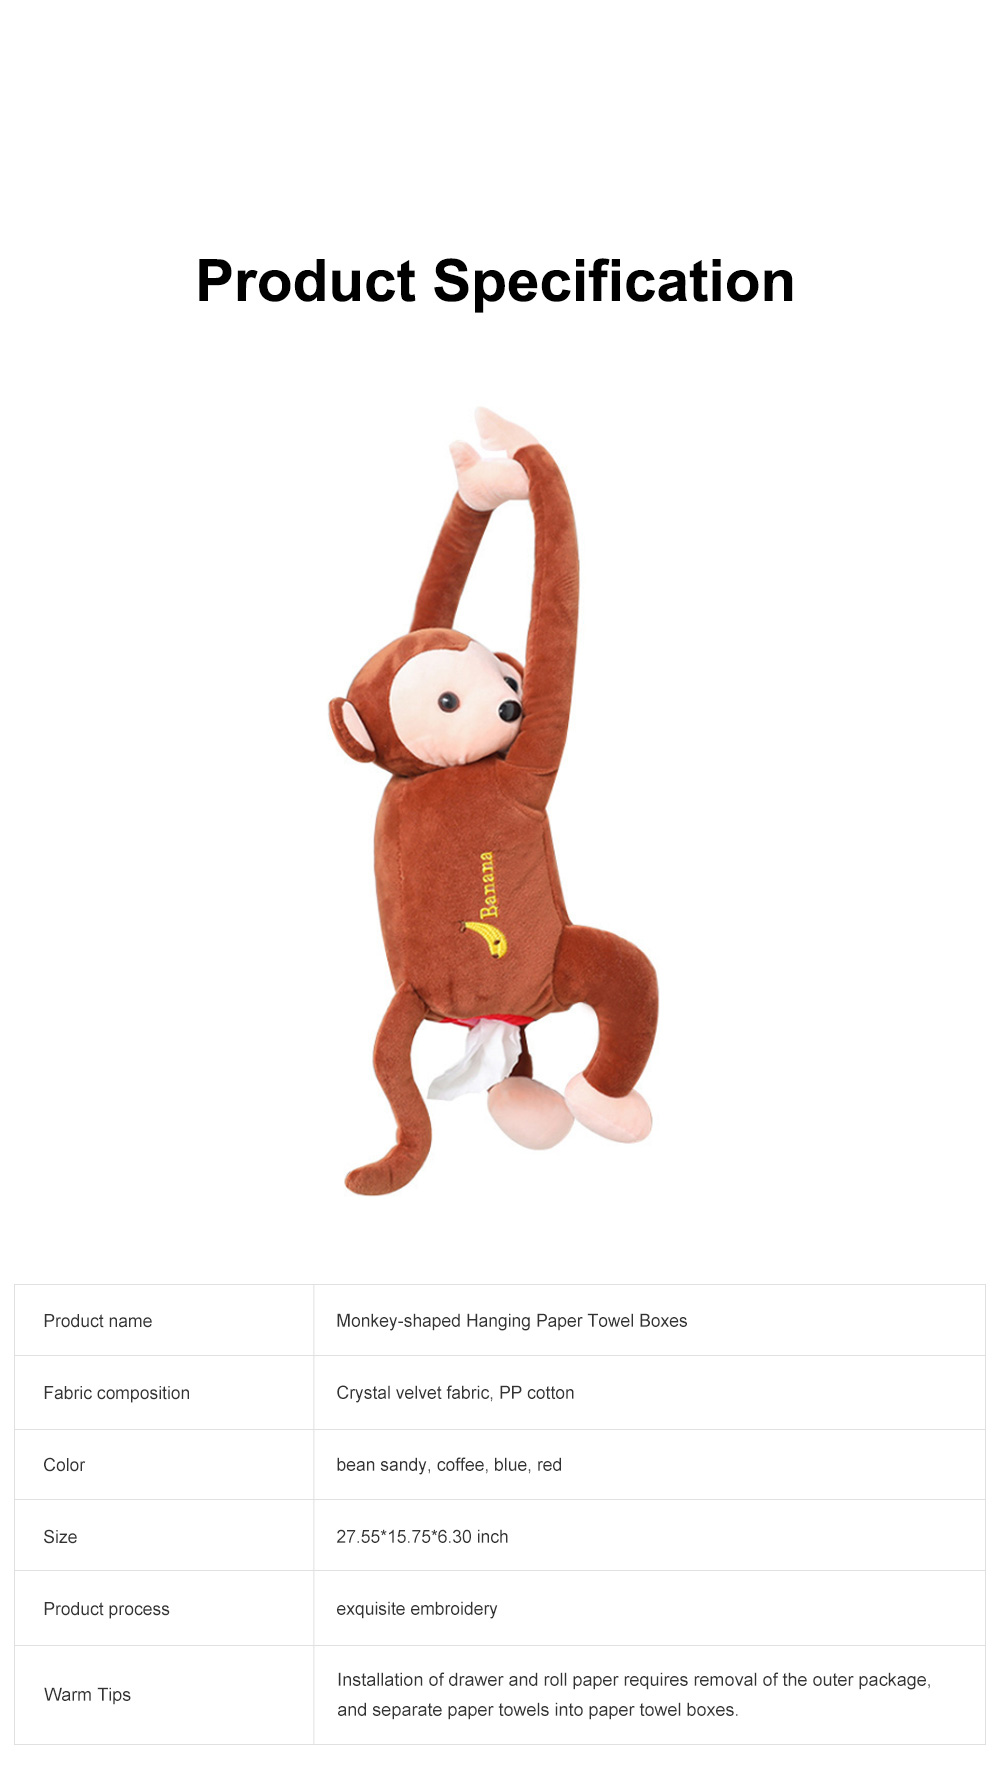 Monkey-shaped Hanging Paper Towel Boxes Popular Car Tissue Bag Pumping Carton Paper Towels Case TikTok Hot 7